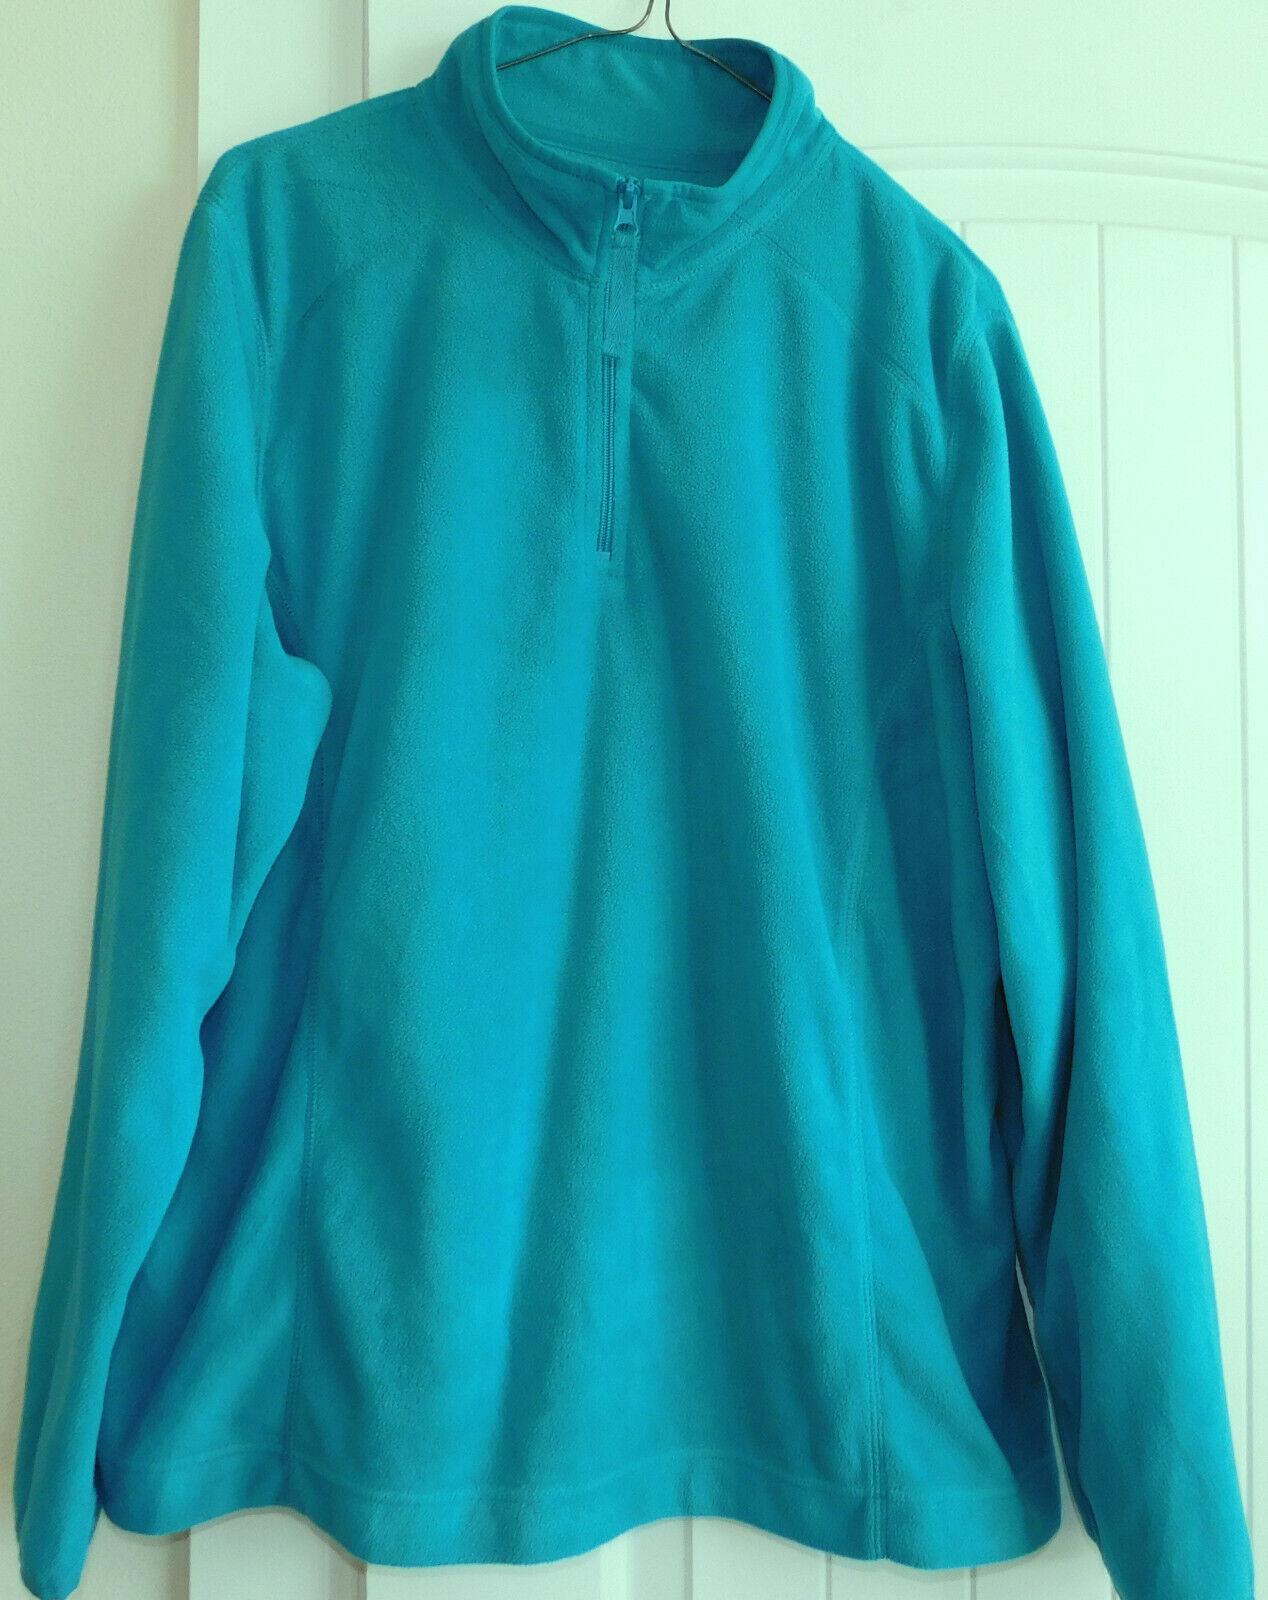 Women's Made For Life 1/4 Zip Fleece Pullover Jacket Top TURQUOISE BLUE XXL